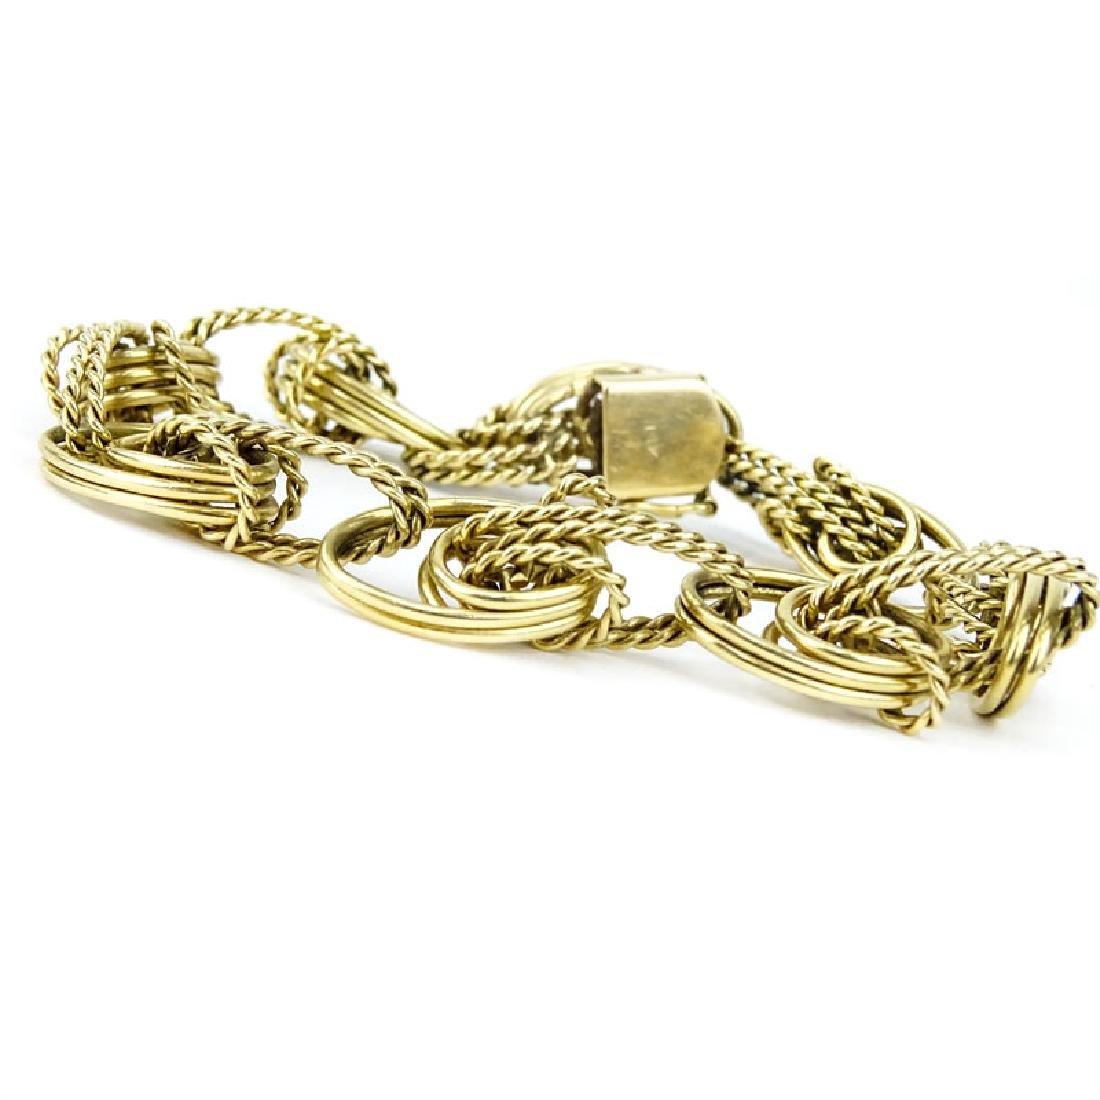 Vintage 14 Karat Yellow Gold Charm Bracelet. Signed